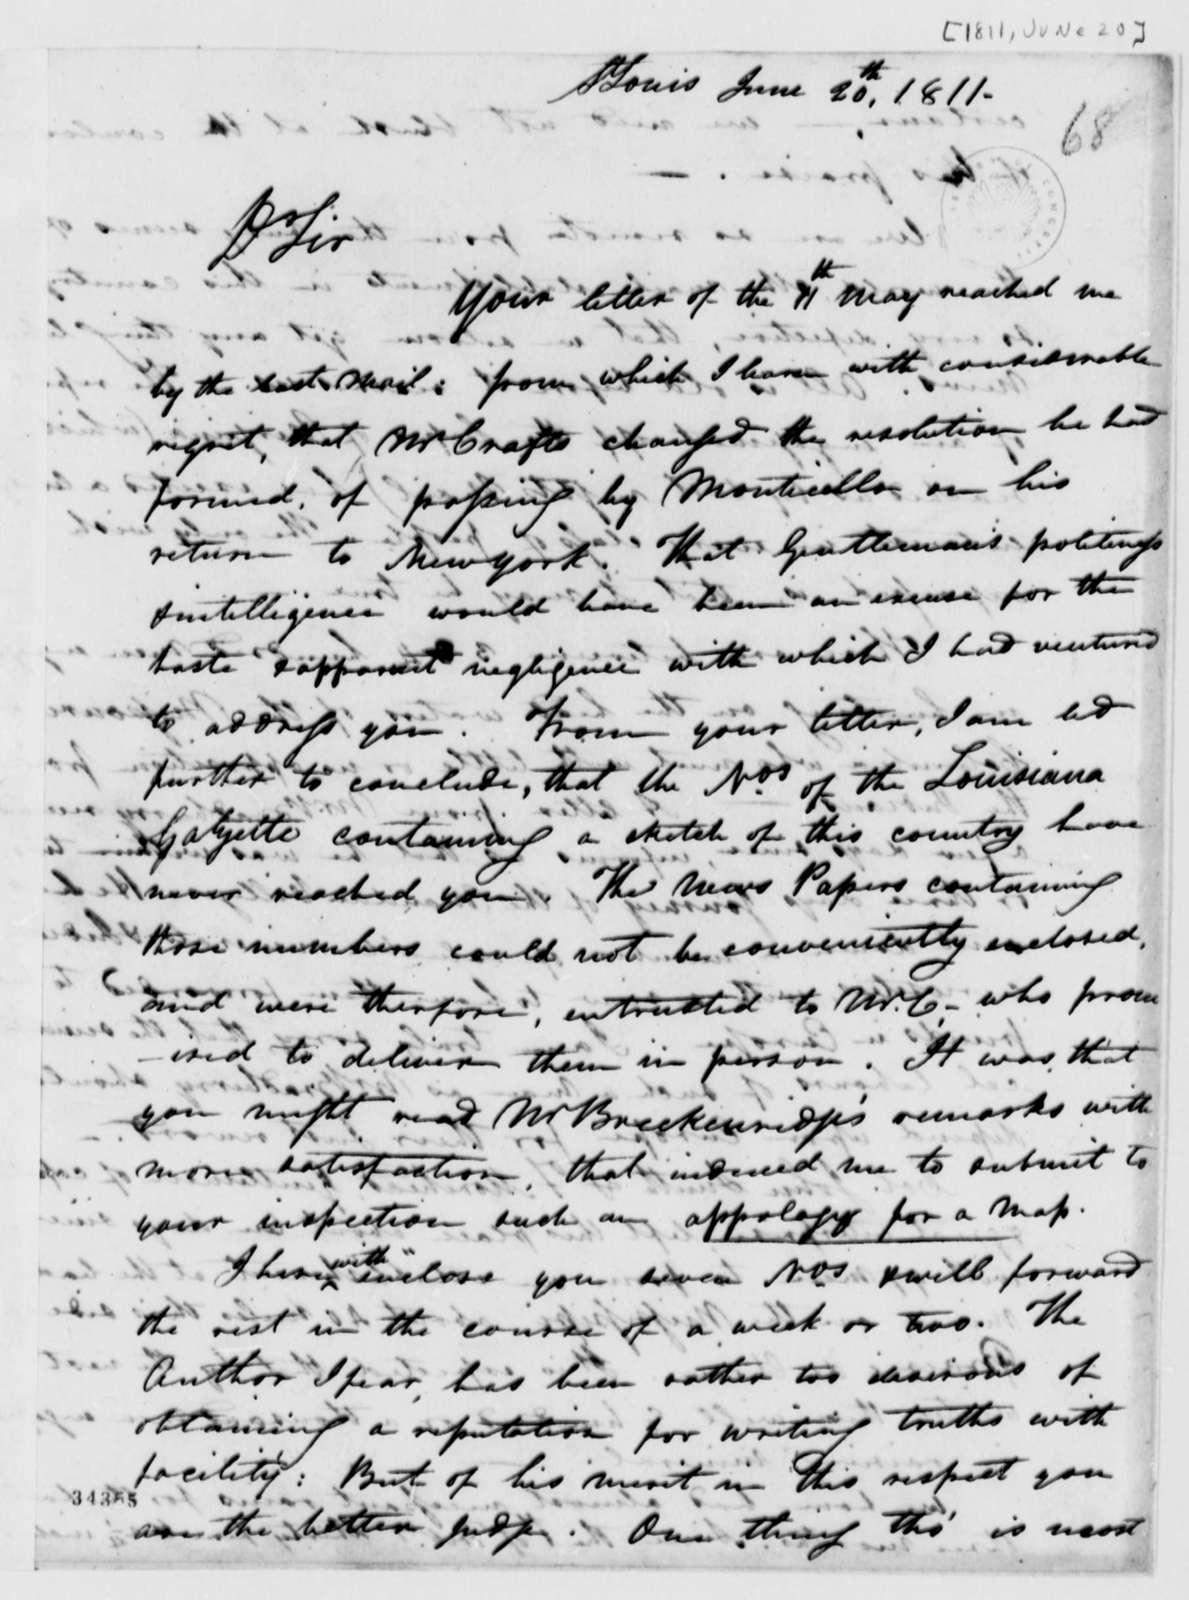 Robart Wash to Thomas Jefferson, June 20, 1811